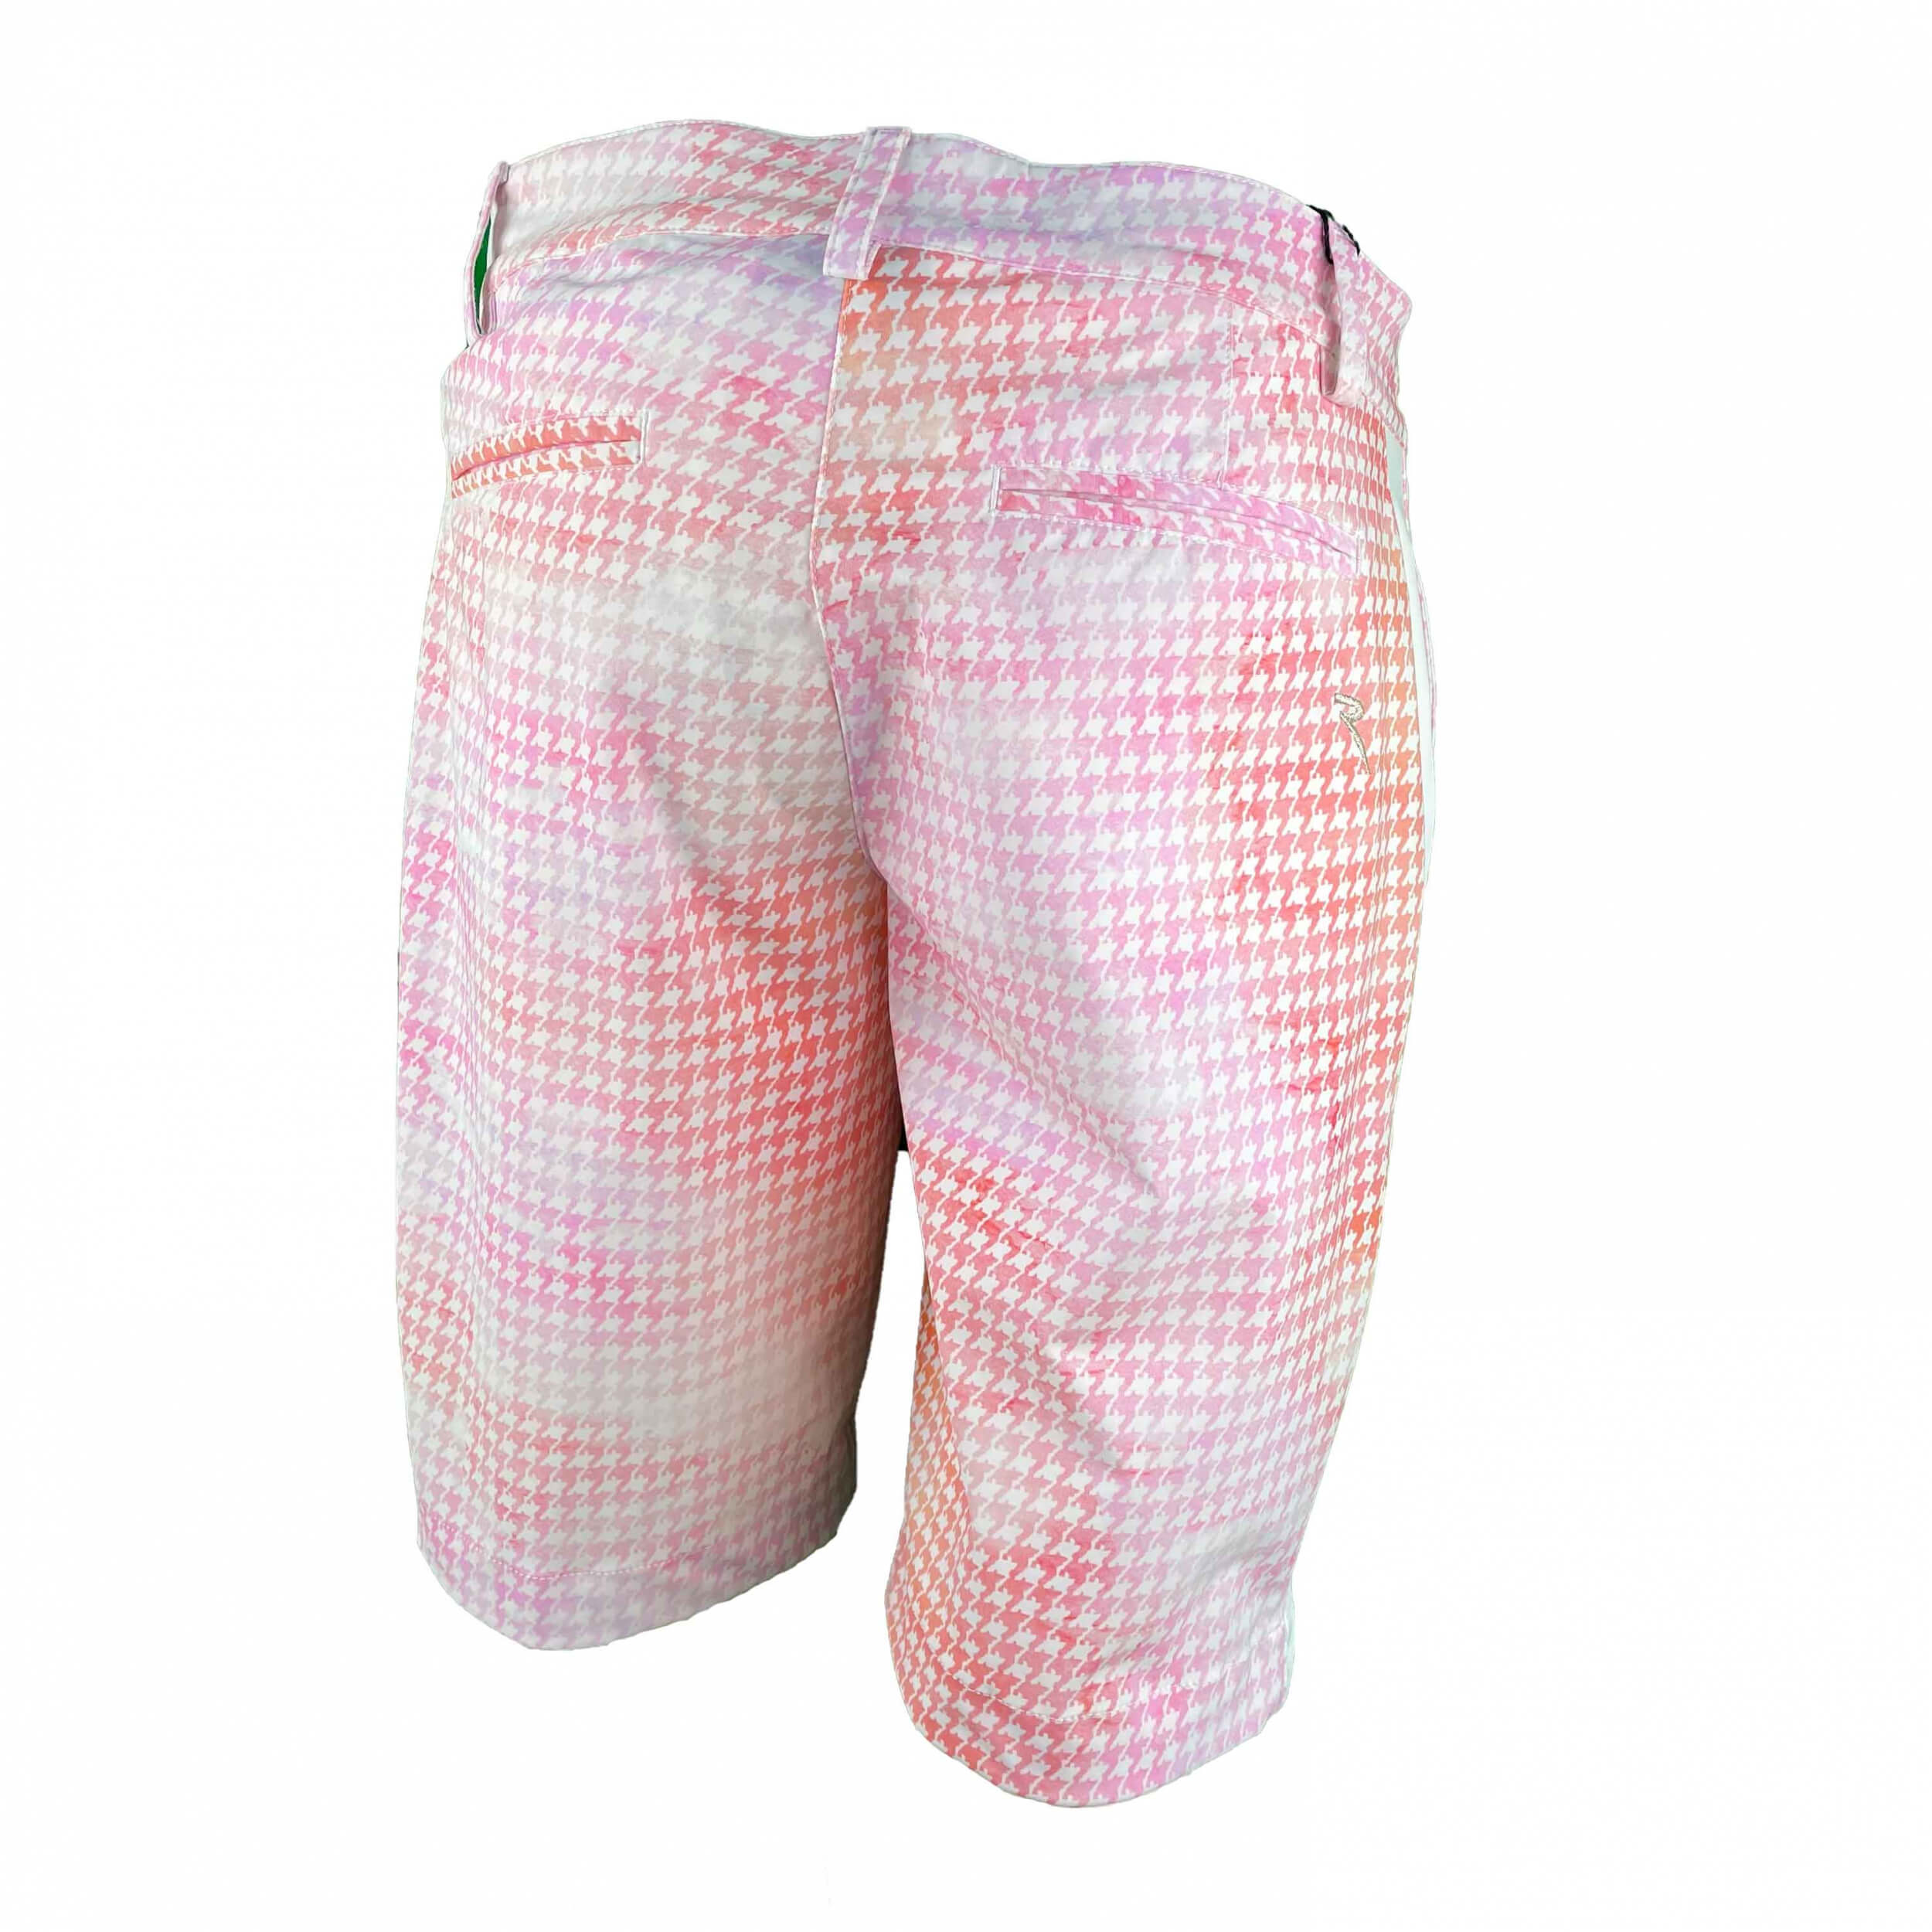 Chervo Damen Short Grenoble SUN BLOCK pink 12G